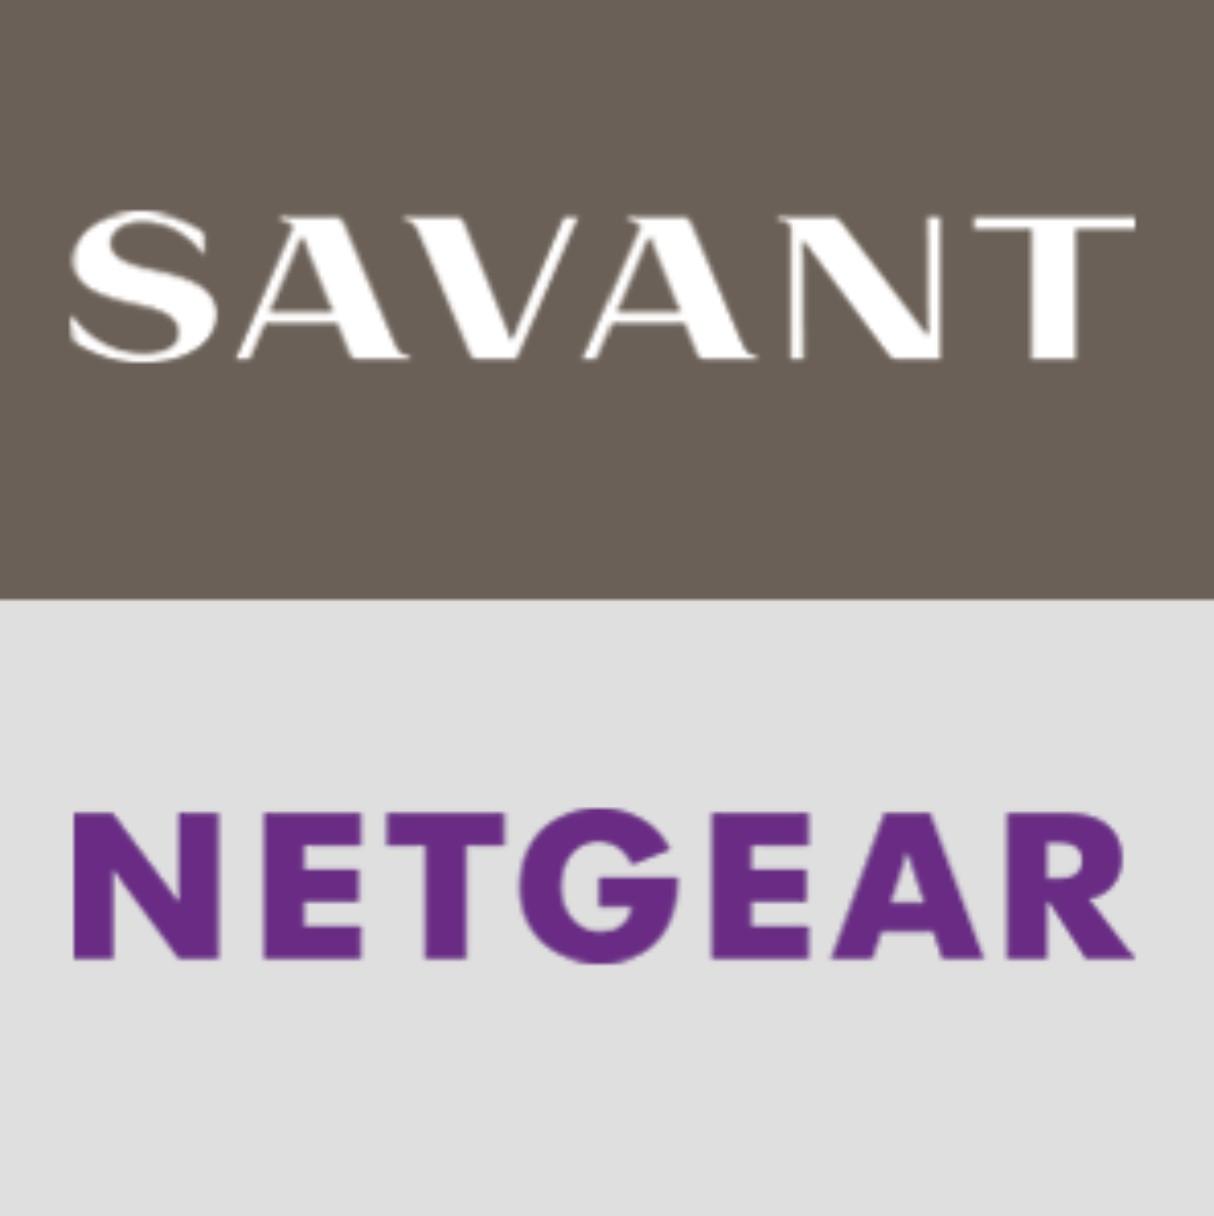 Savant's Enhanced NETGEAR Partnership To Benefit Integrators